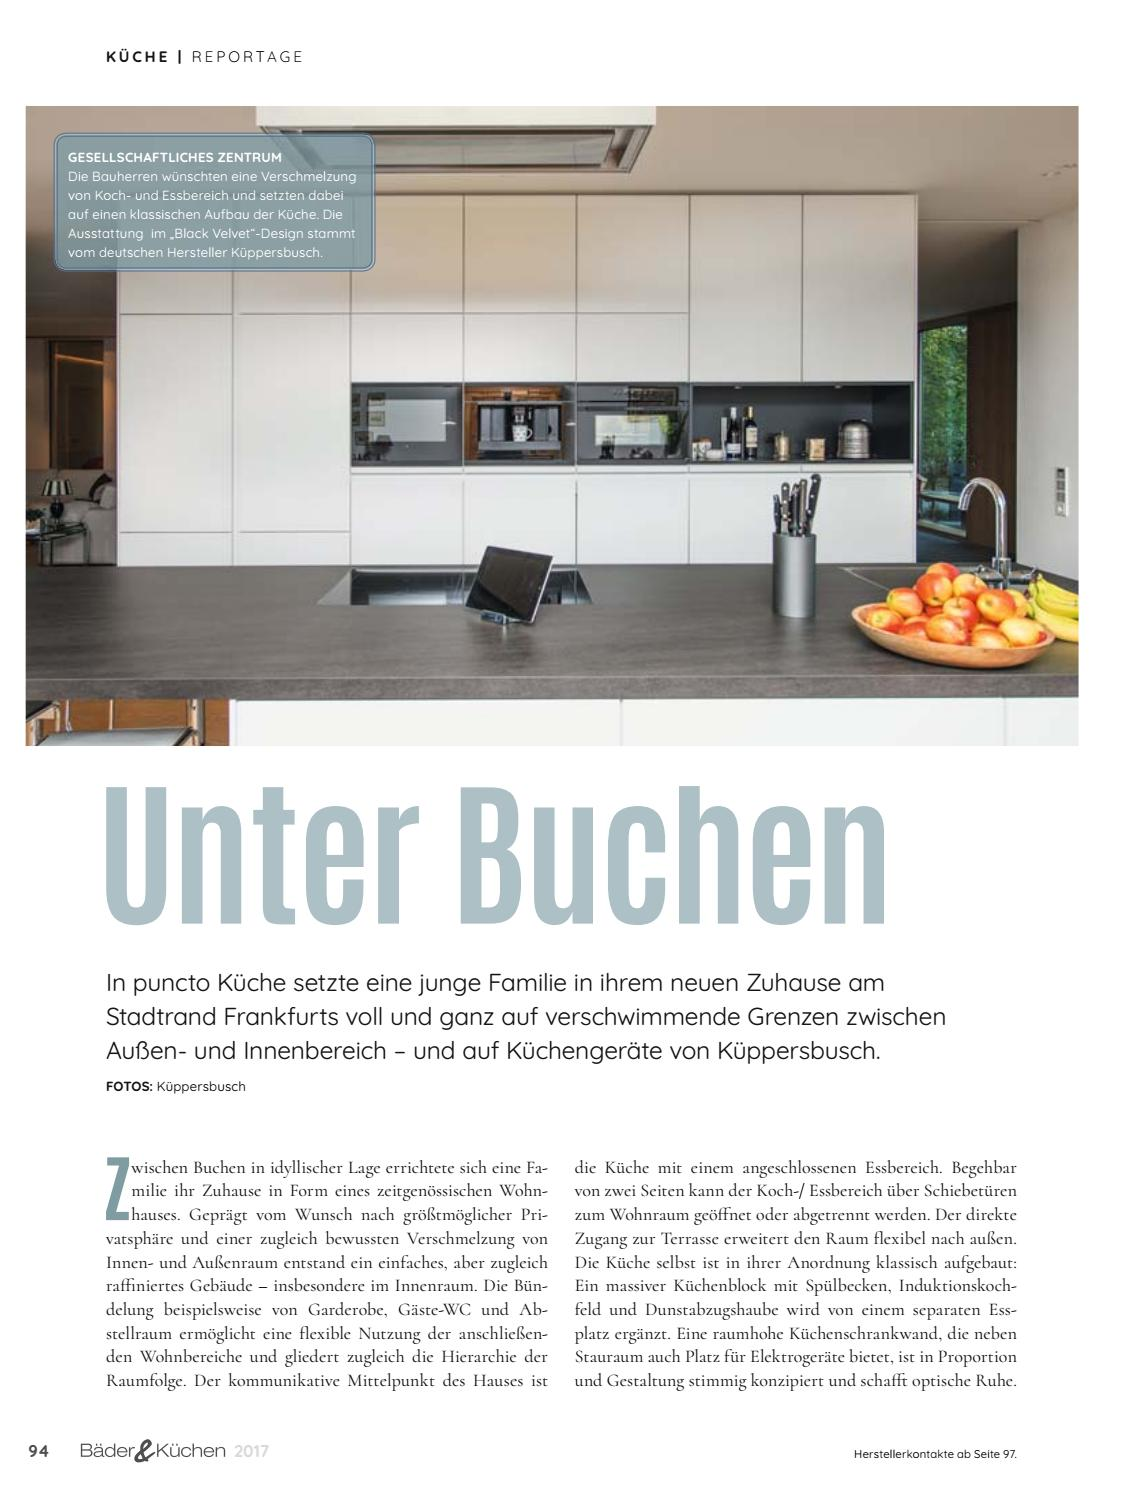 Bader Kuchen 2017 By Family Home Verlag Gmbh Issuu